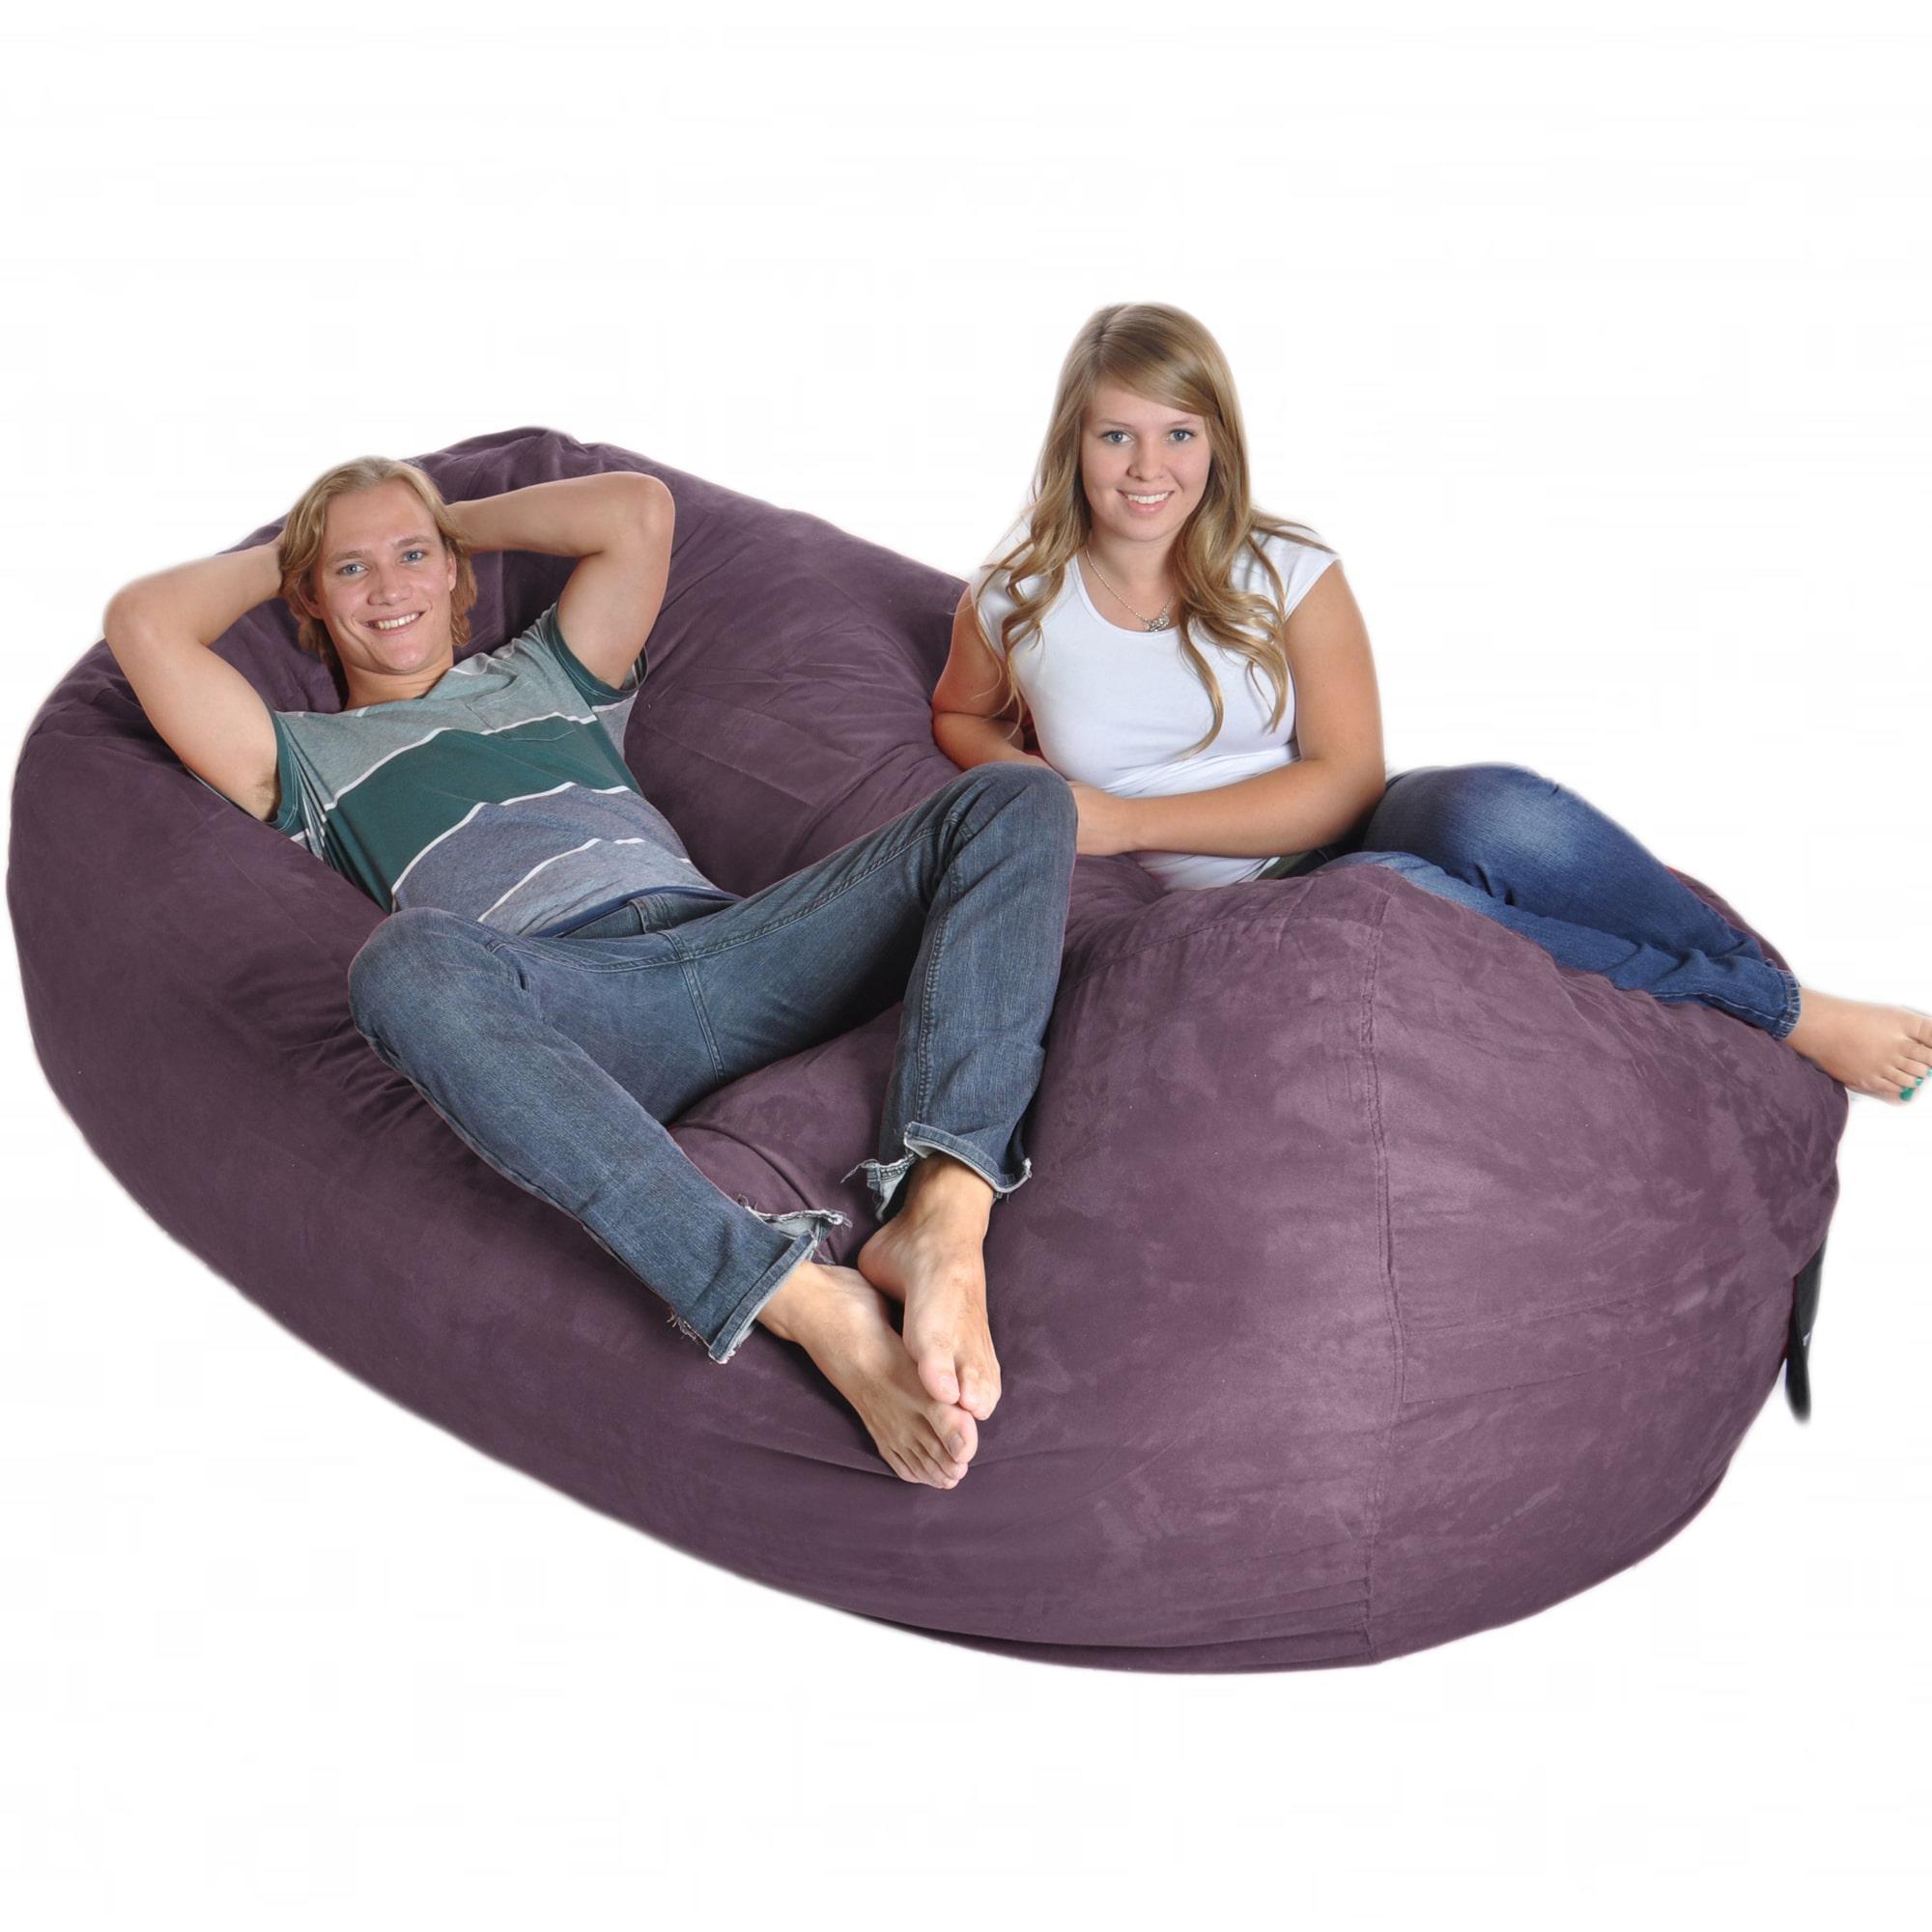 Slacker Sack Purple 8-foot Oval Microfiber/ Memory Foam Bean Bag